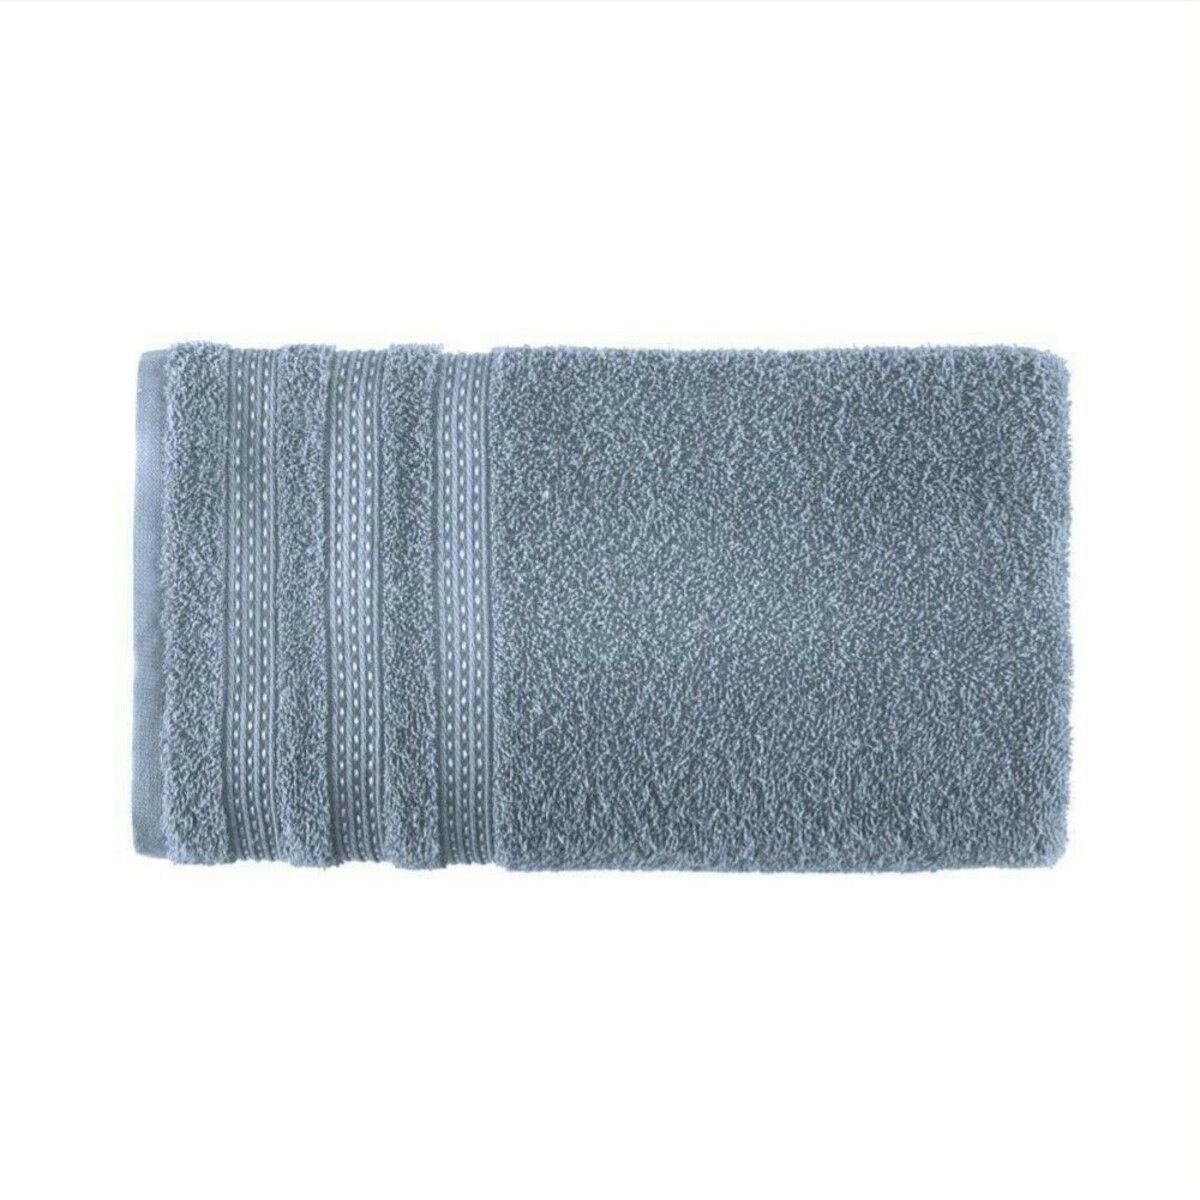 Toalha banho marcel 67x135 Allure